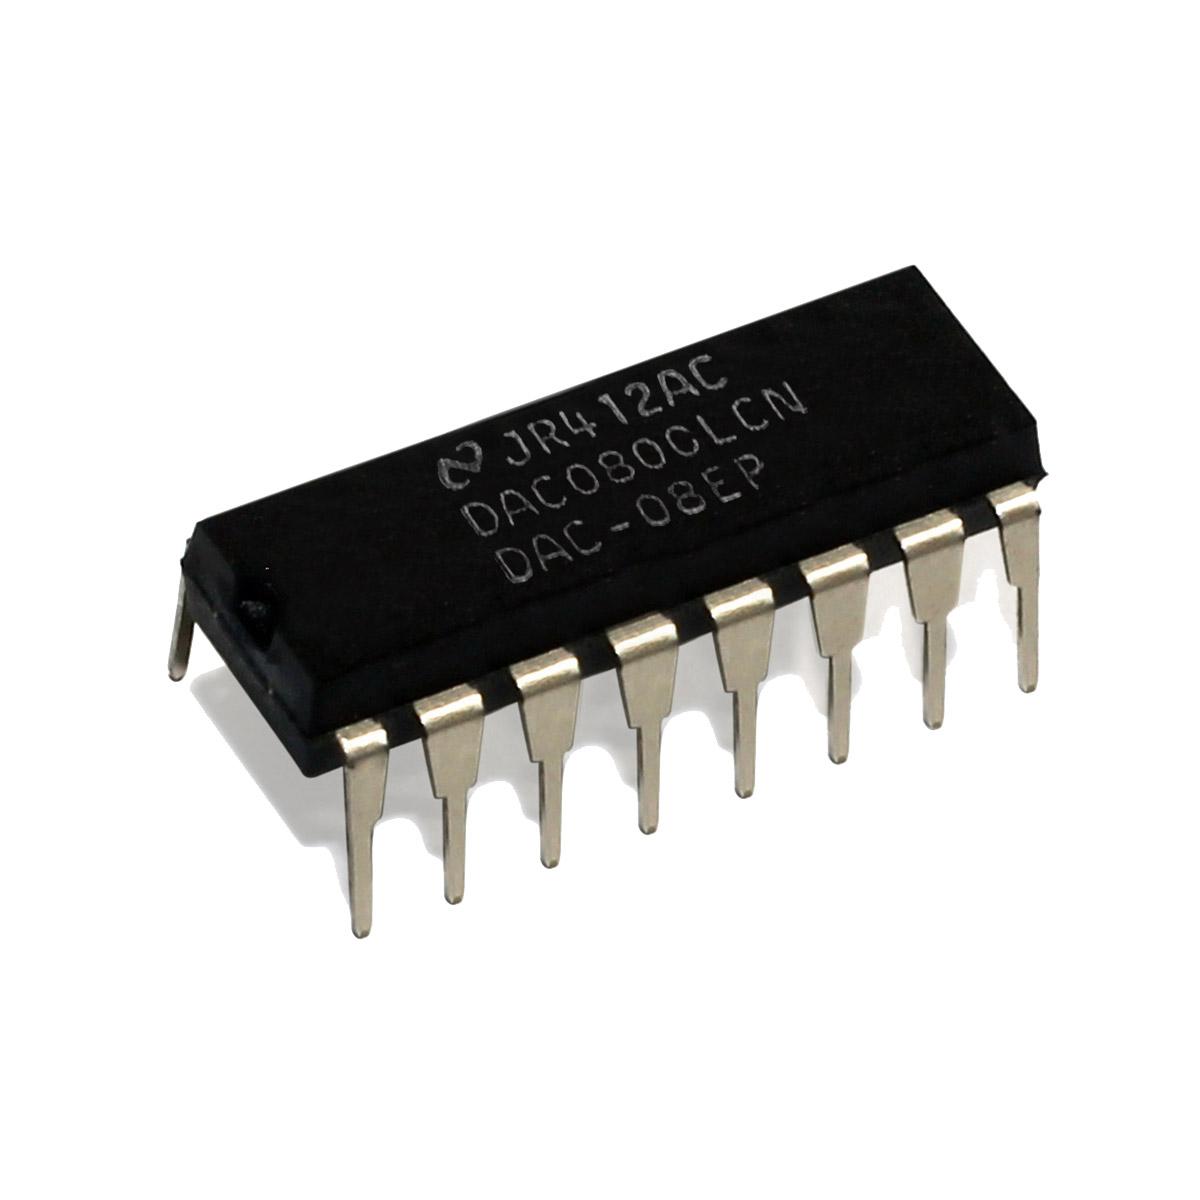 hight resolution of circuito integrado dac 0800